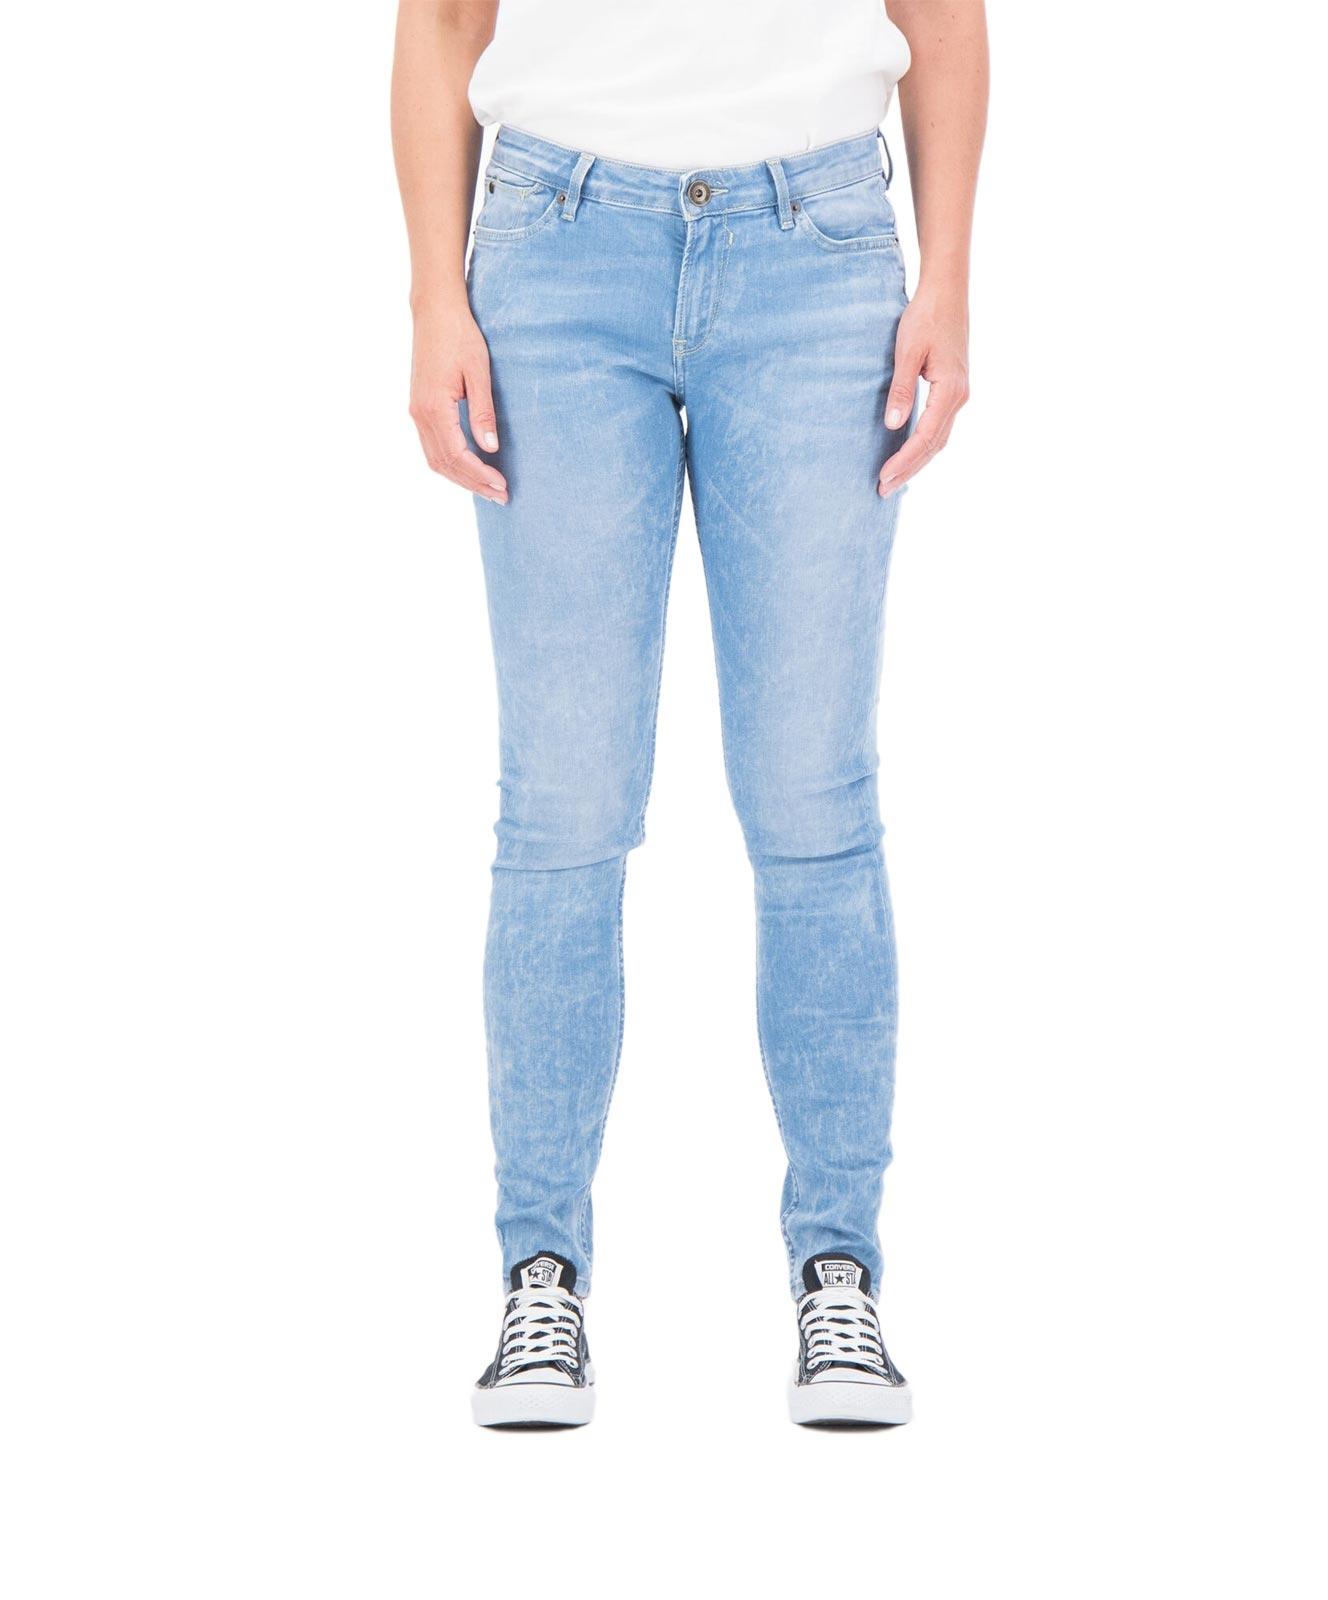 Hosen - Garcia Slim Fit Jeans Rachelle in Light Used  - Onlineshop Jeans Meile